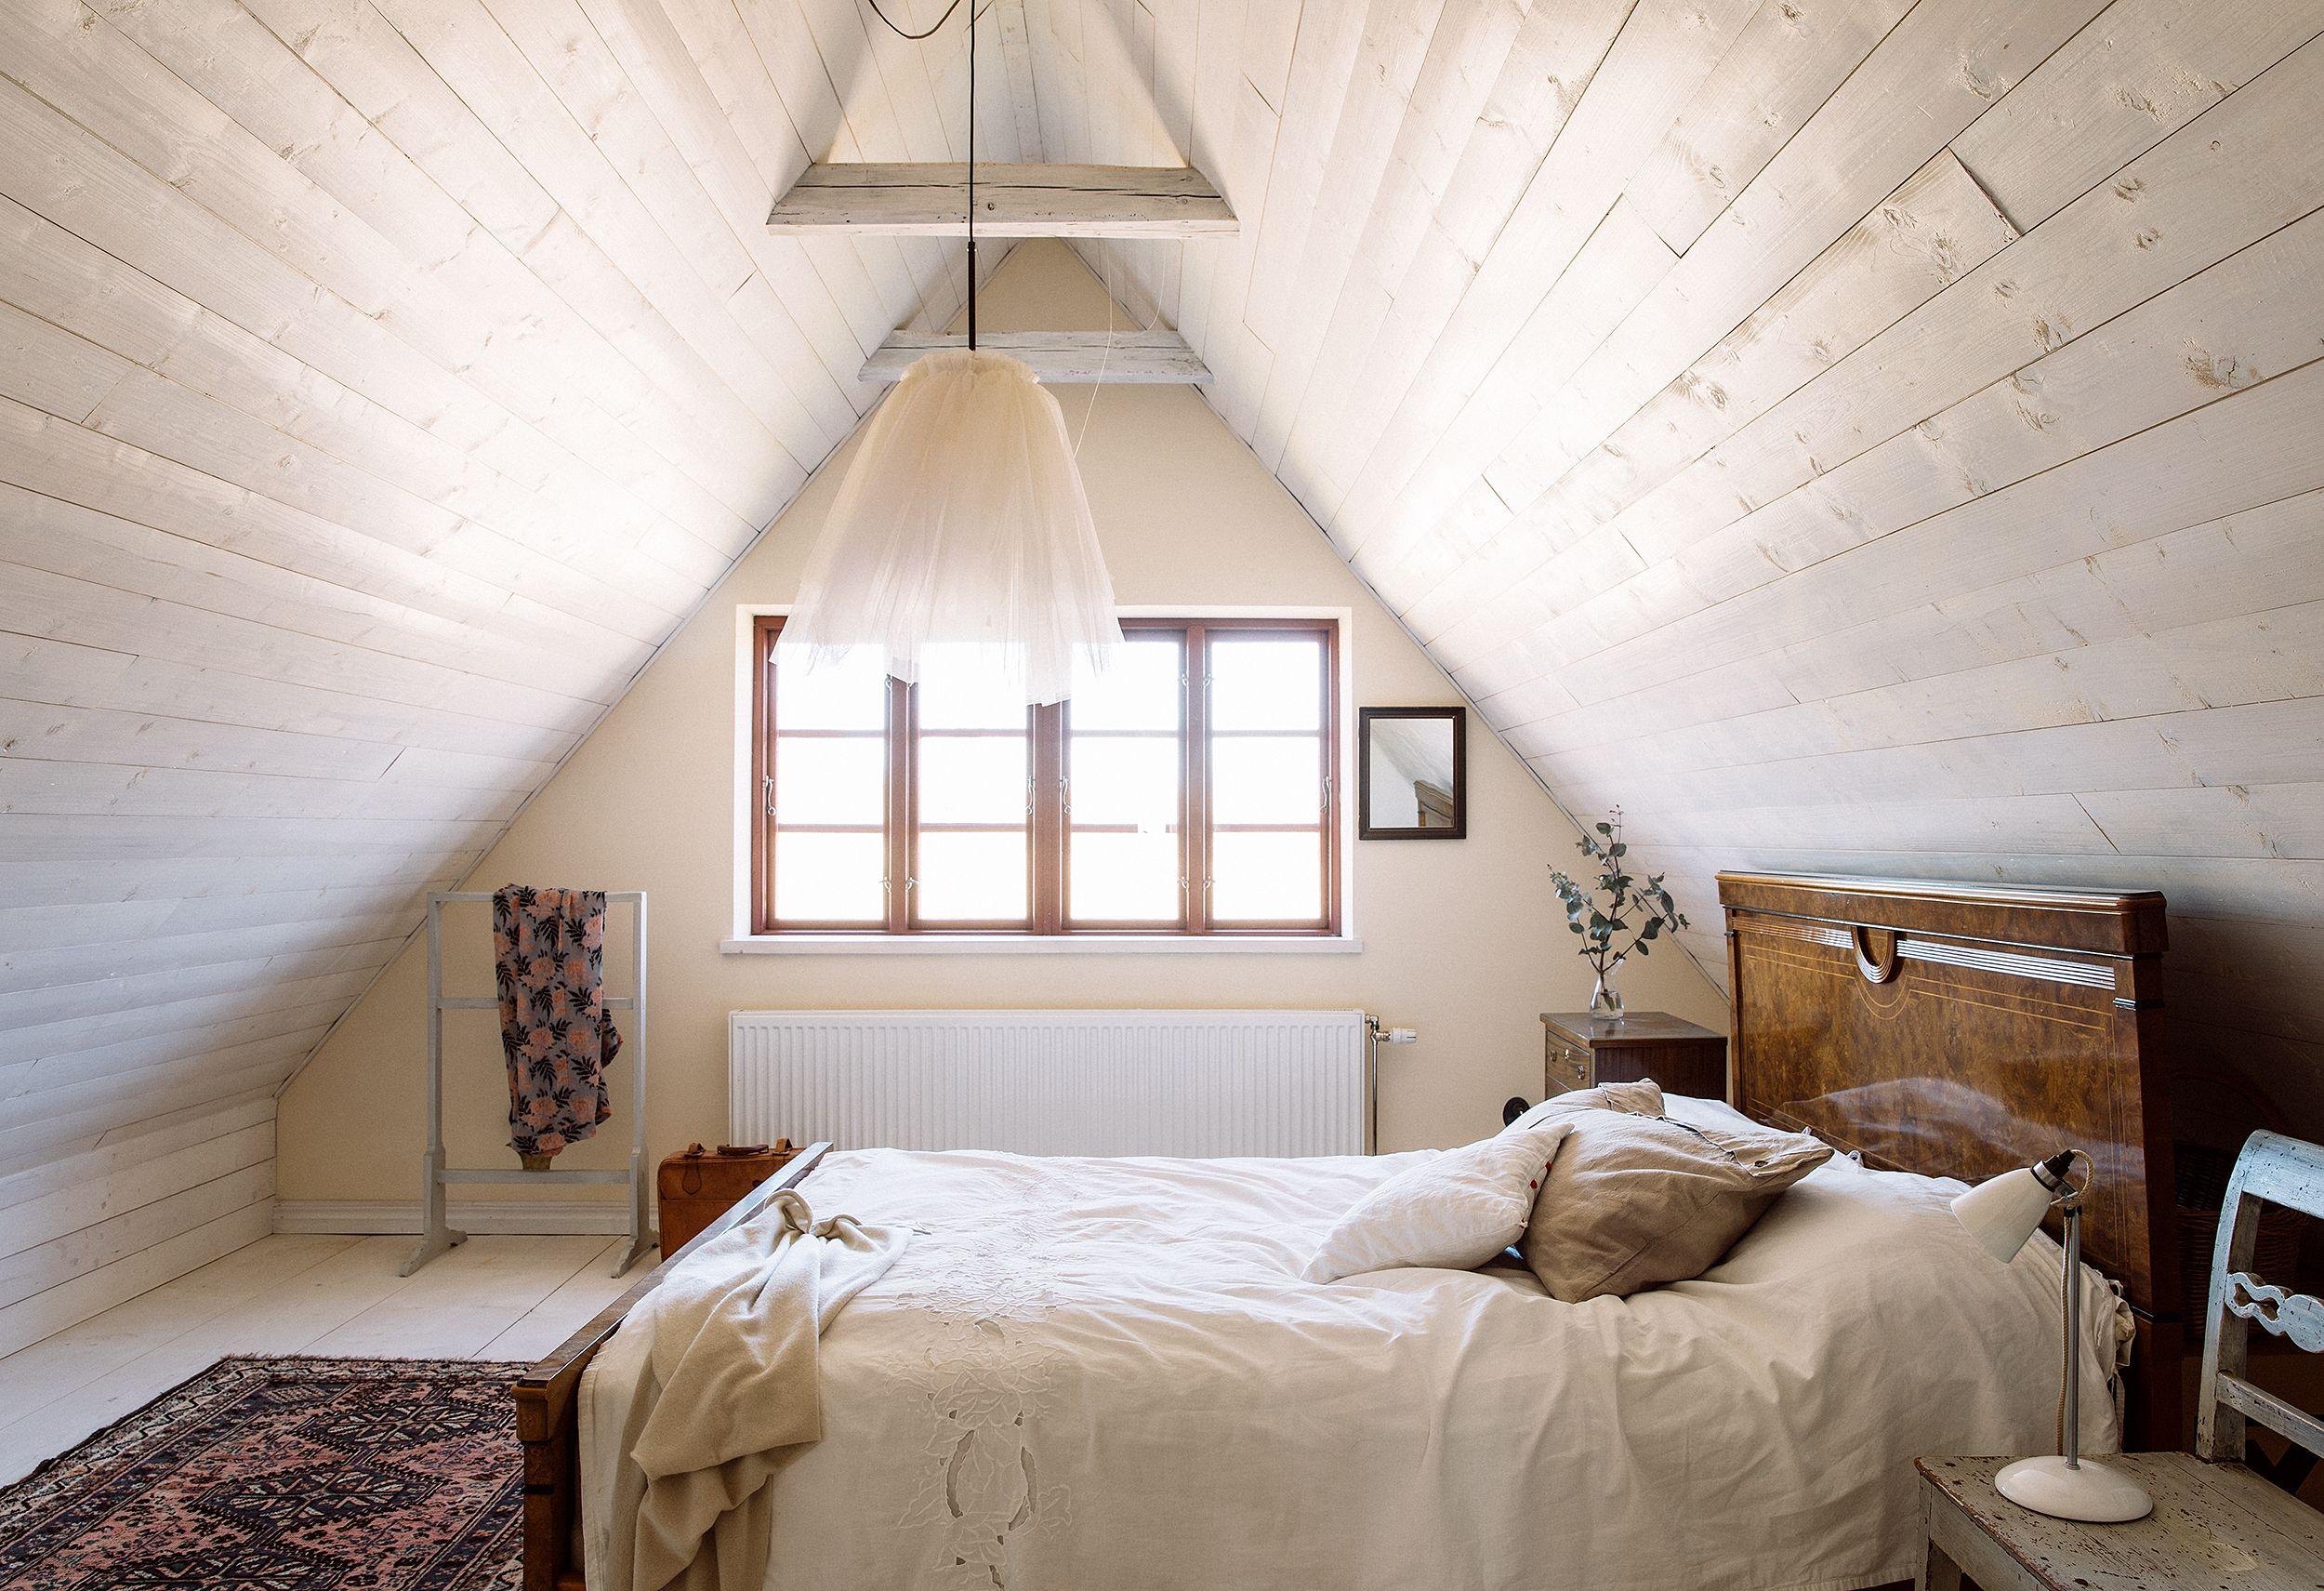 Merveilleux Attic Bedroom Ideas